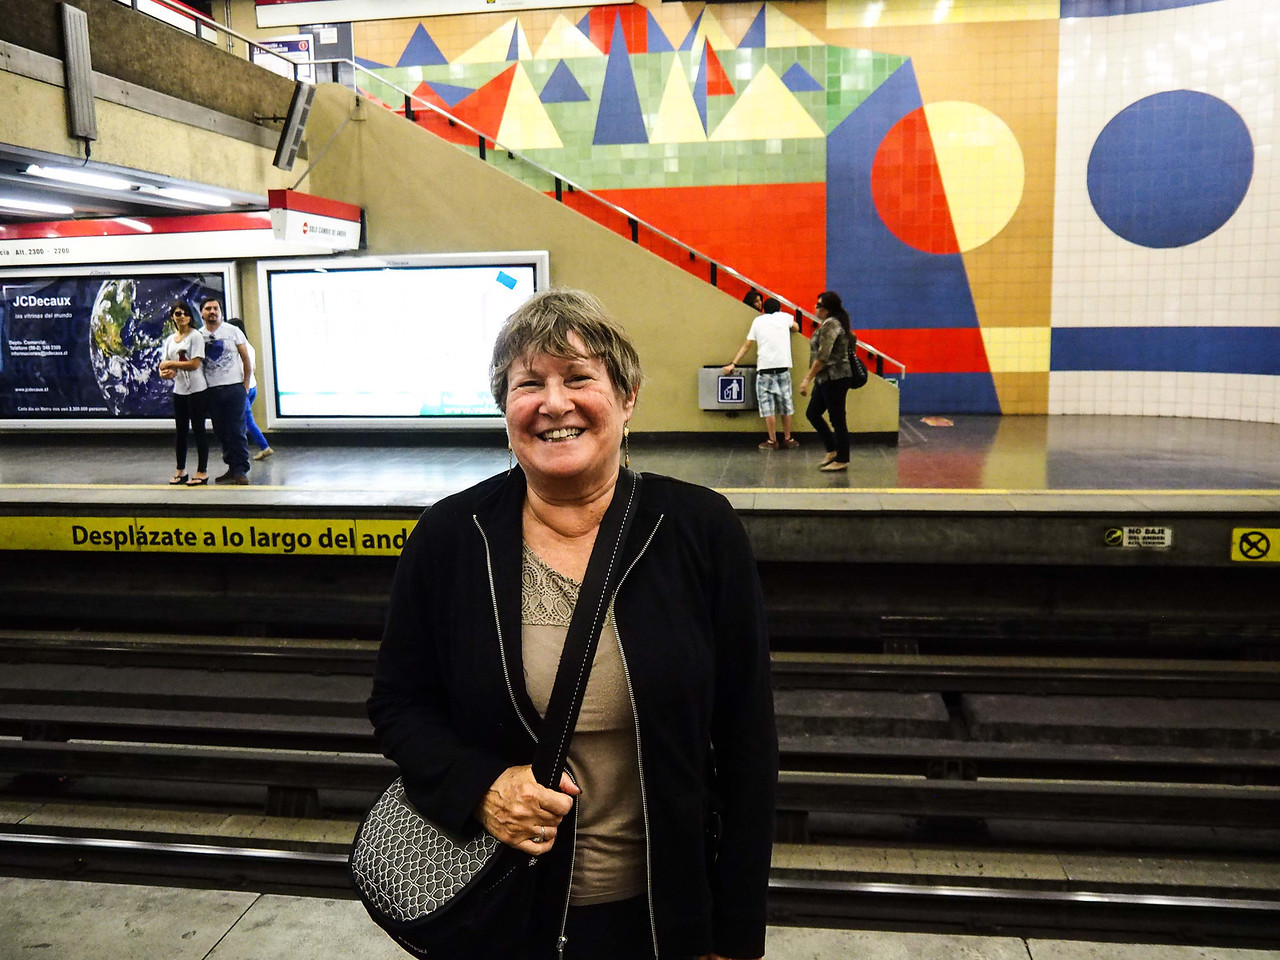 Waiting for the Metro, Santiago